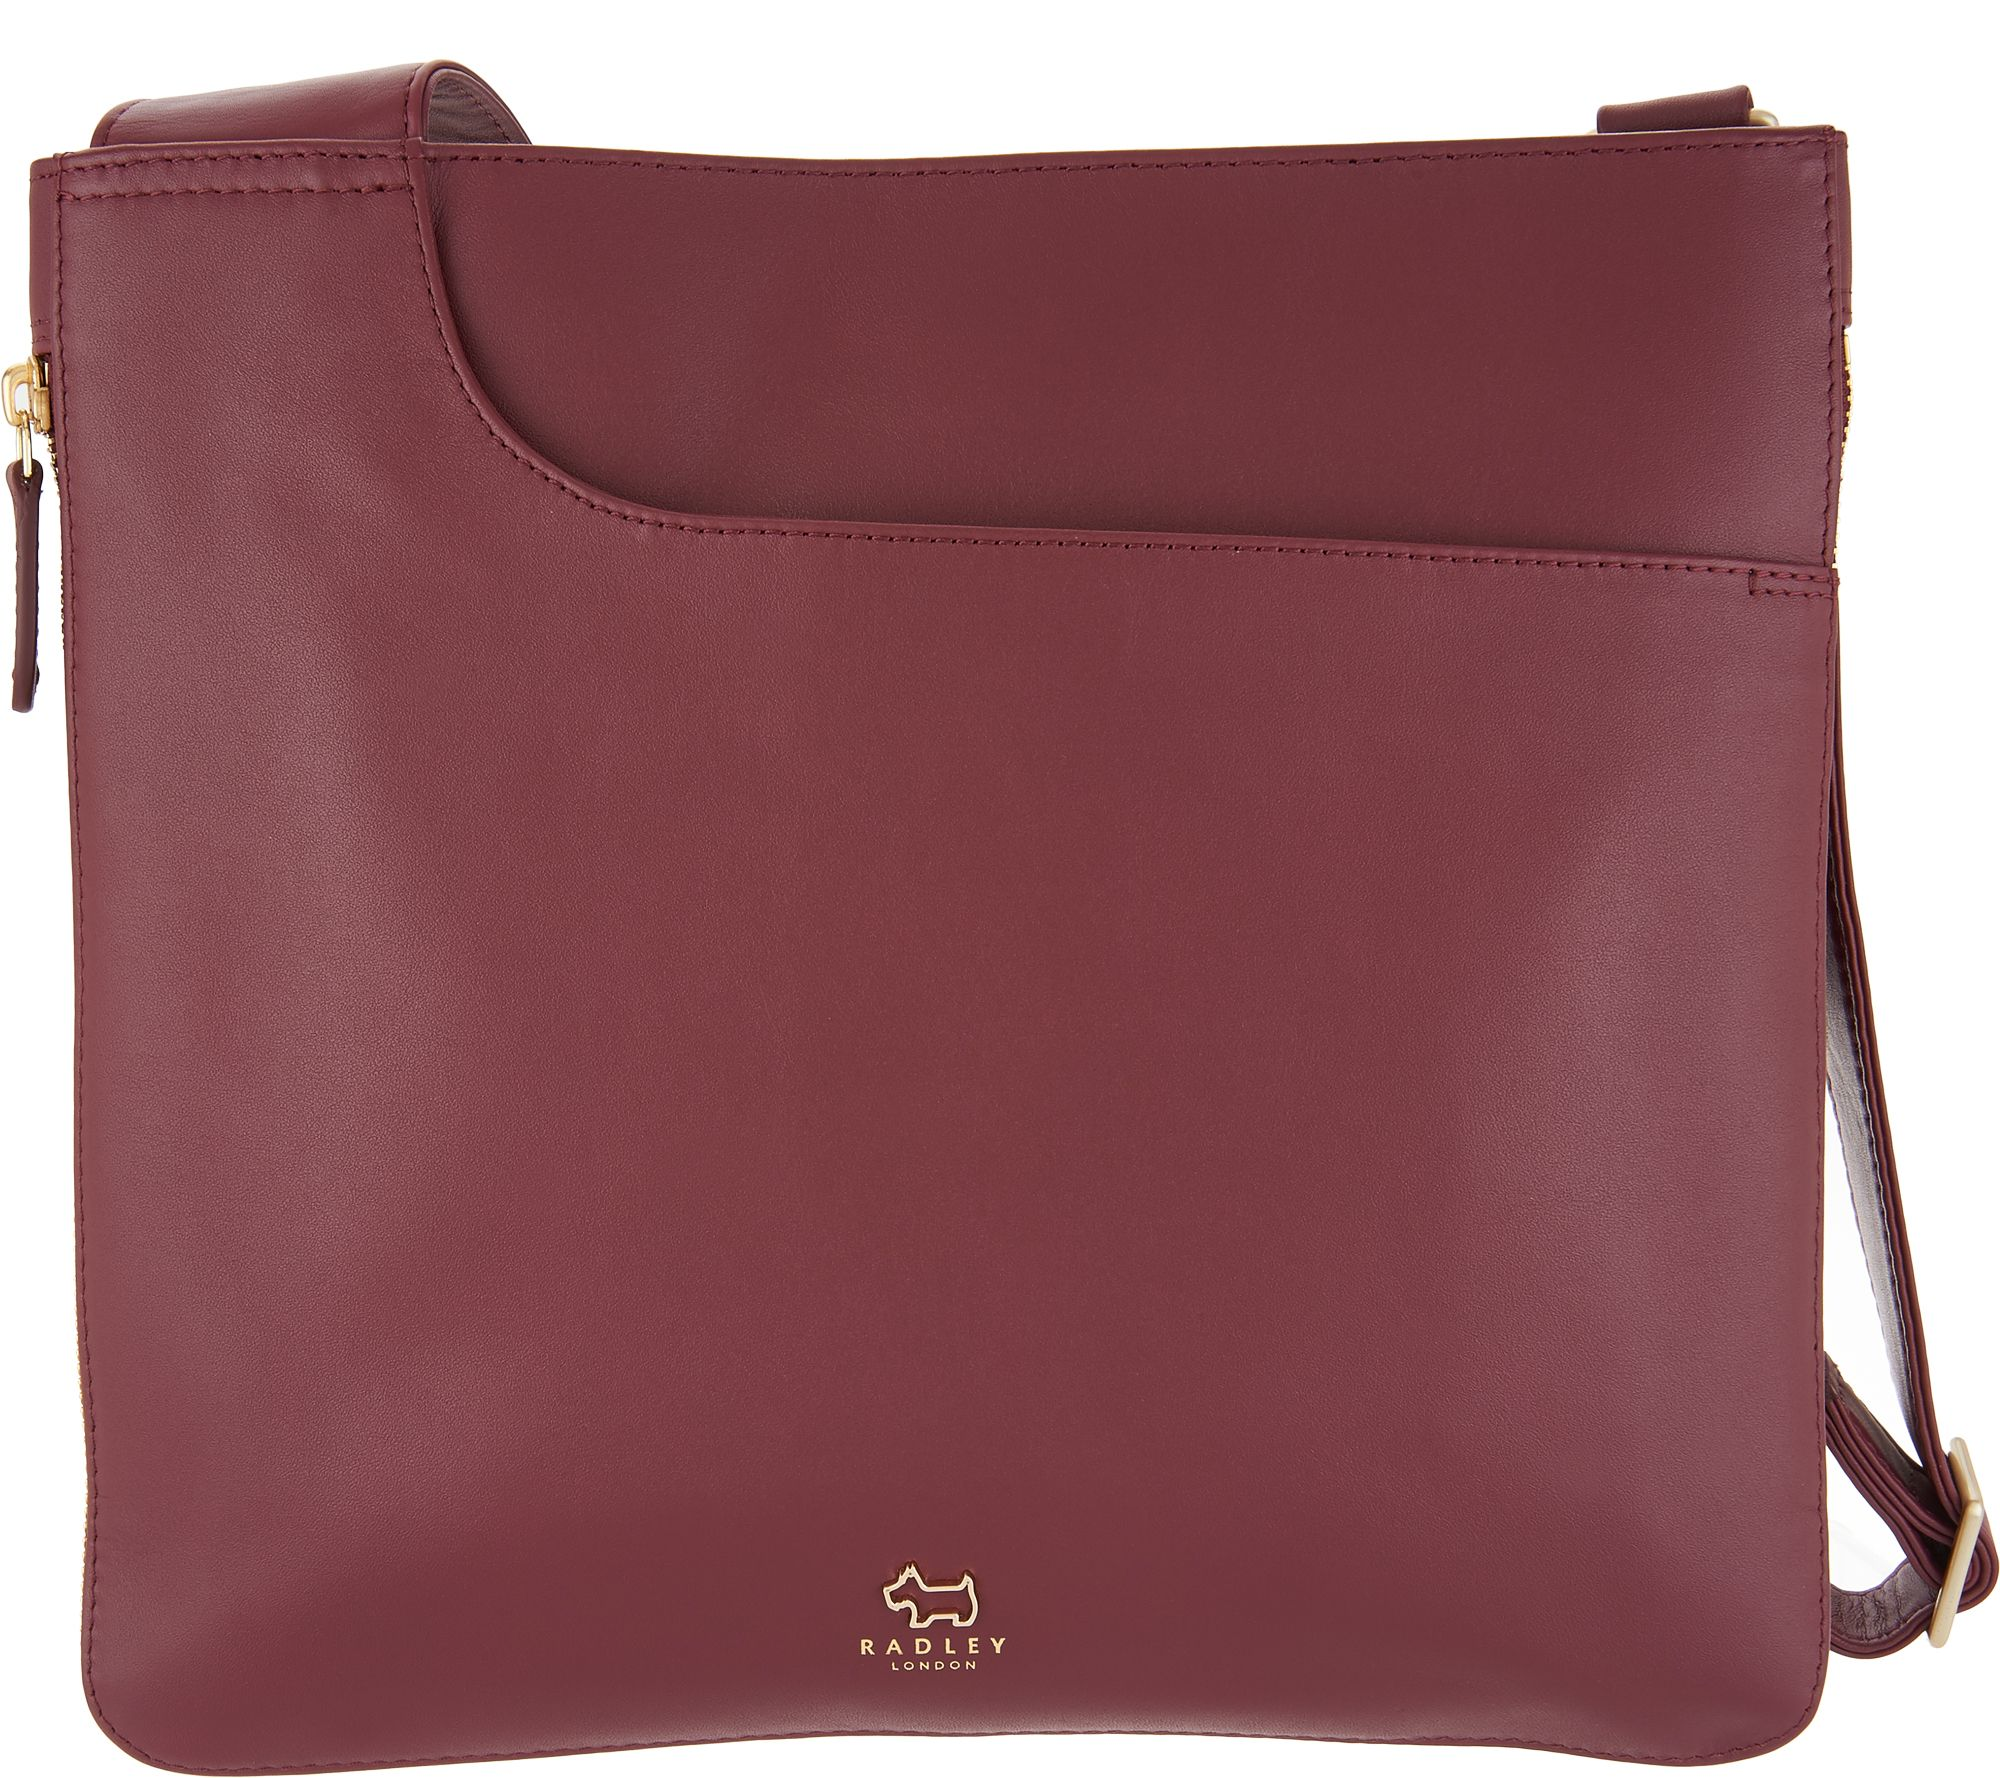 RADLEY London Pocket Leather Large Zip-Top Crossbody - Page 1 — QVC.com 2ab196e6a9645